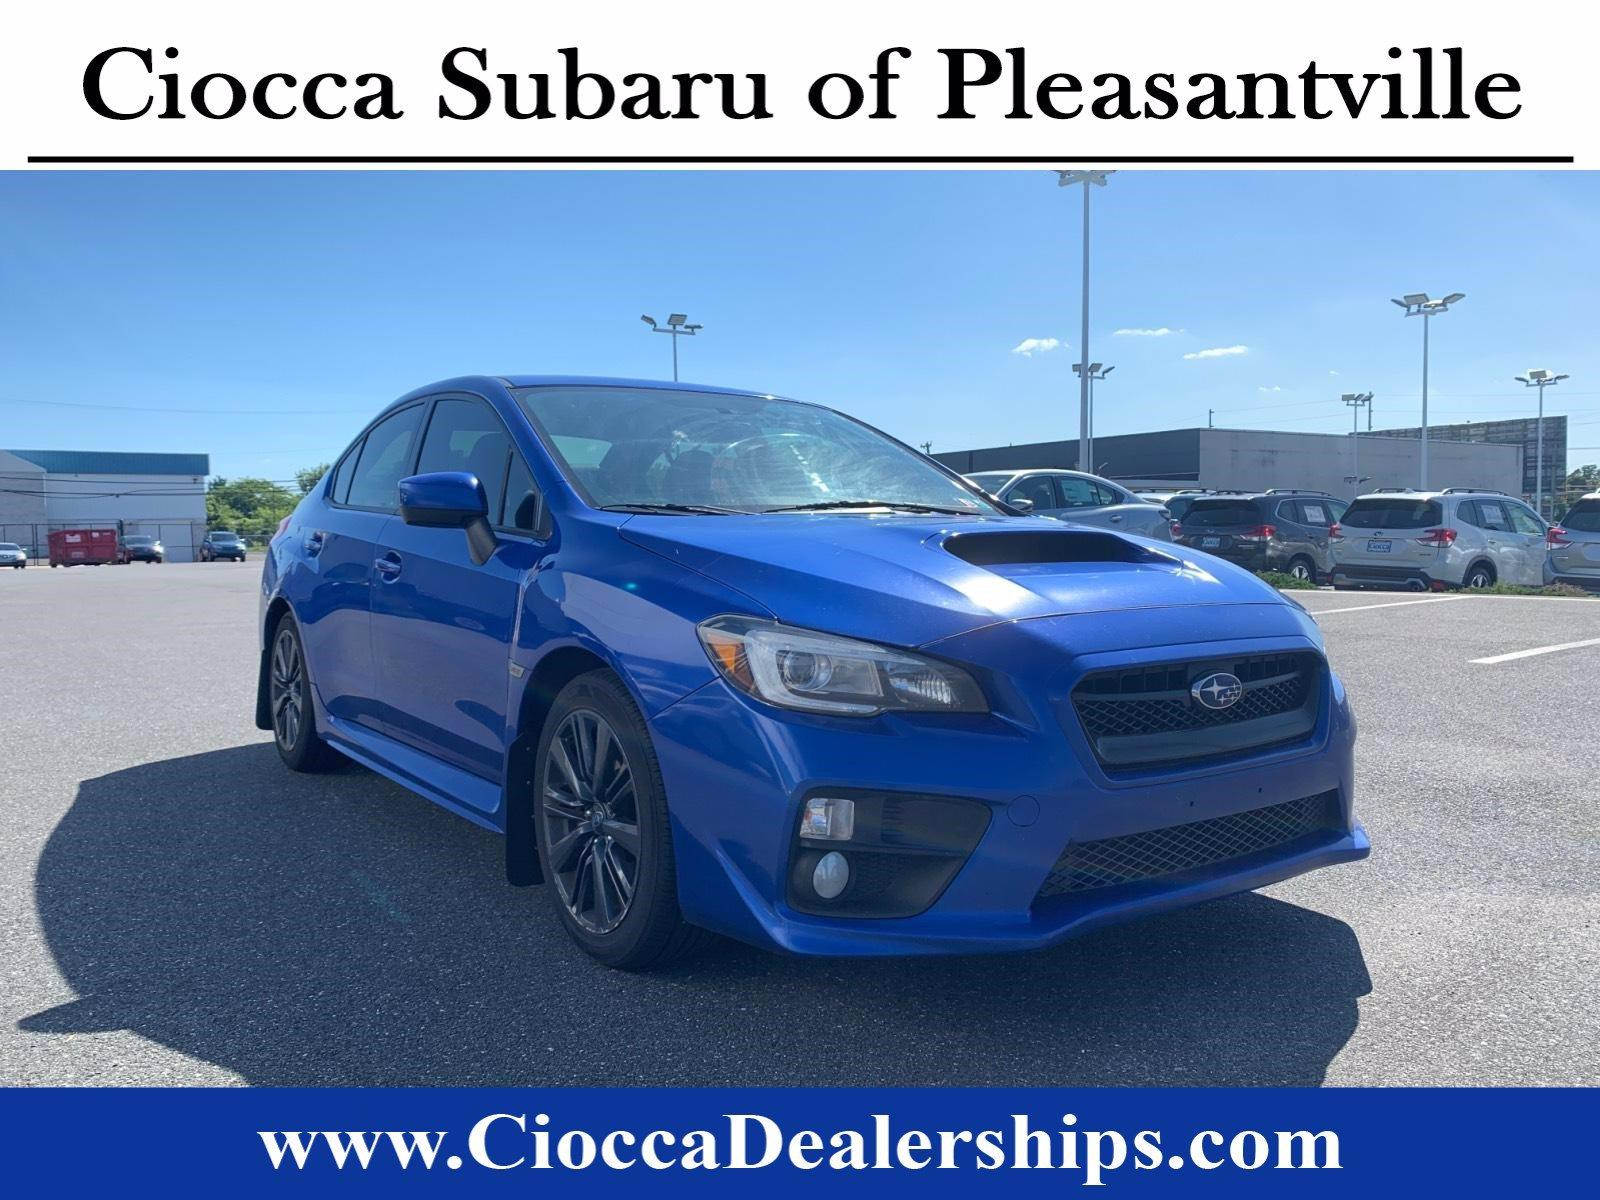 2015 Subaru WRX Vehicle Photo in Pleasantville, NJ 08232